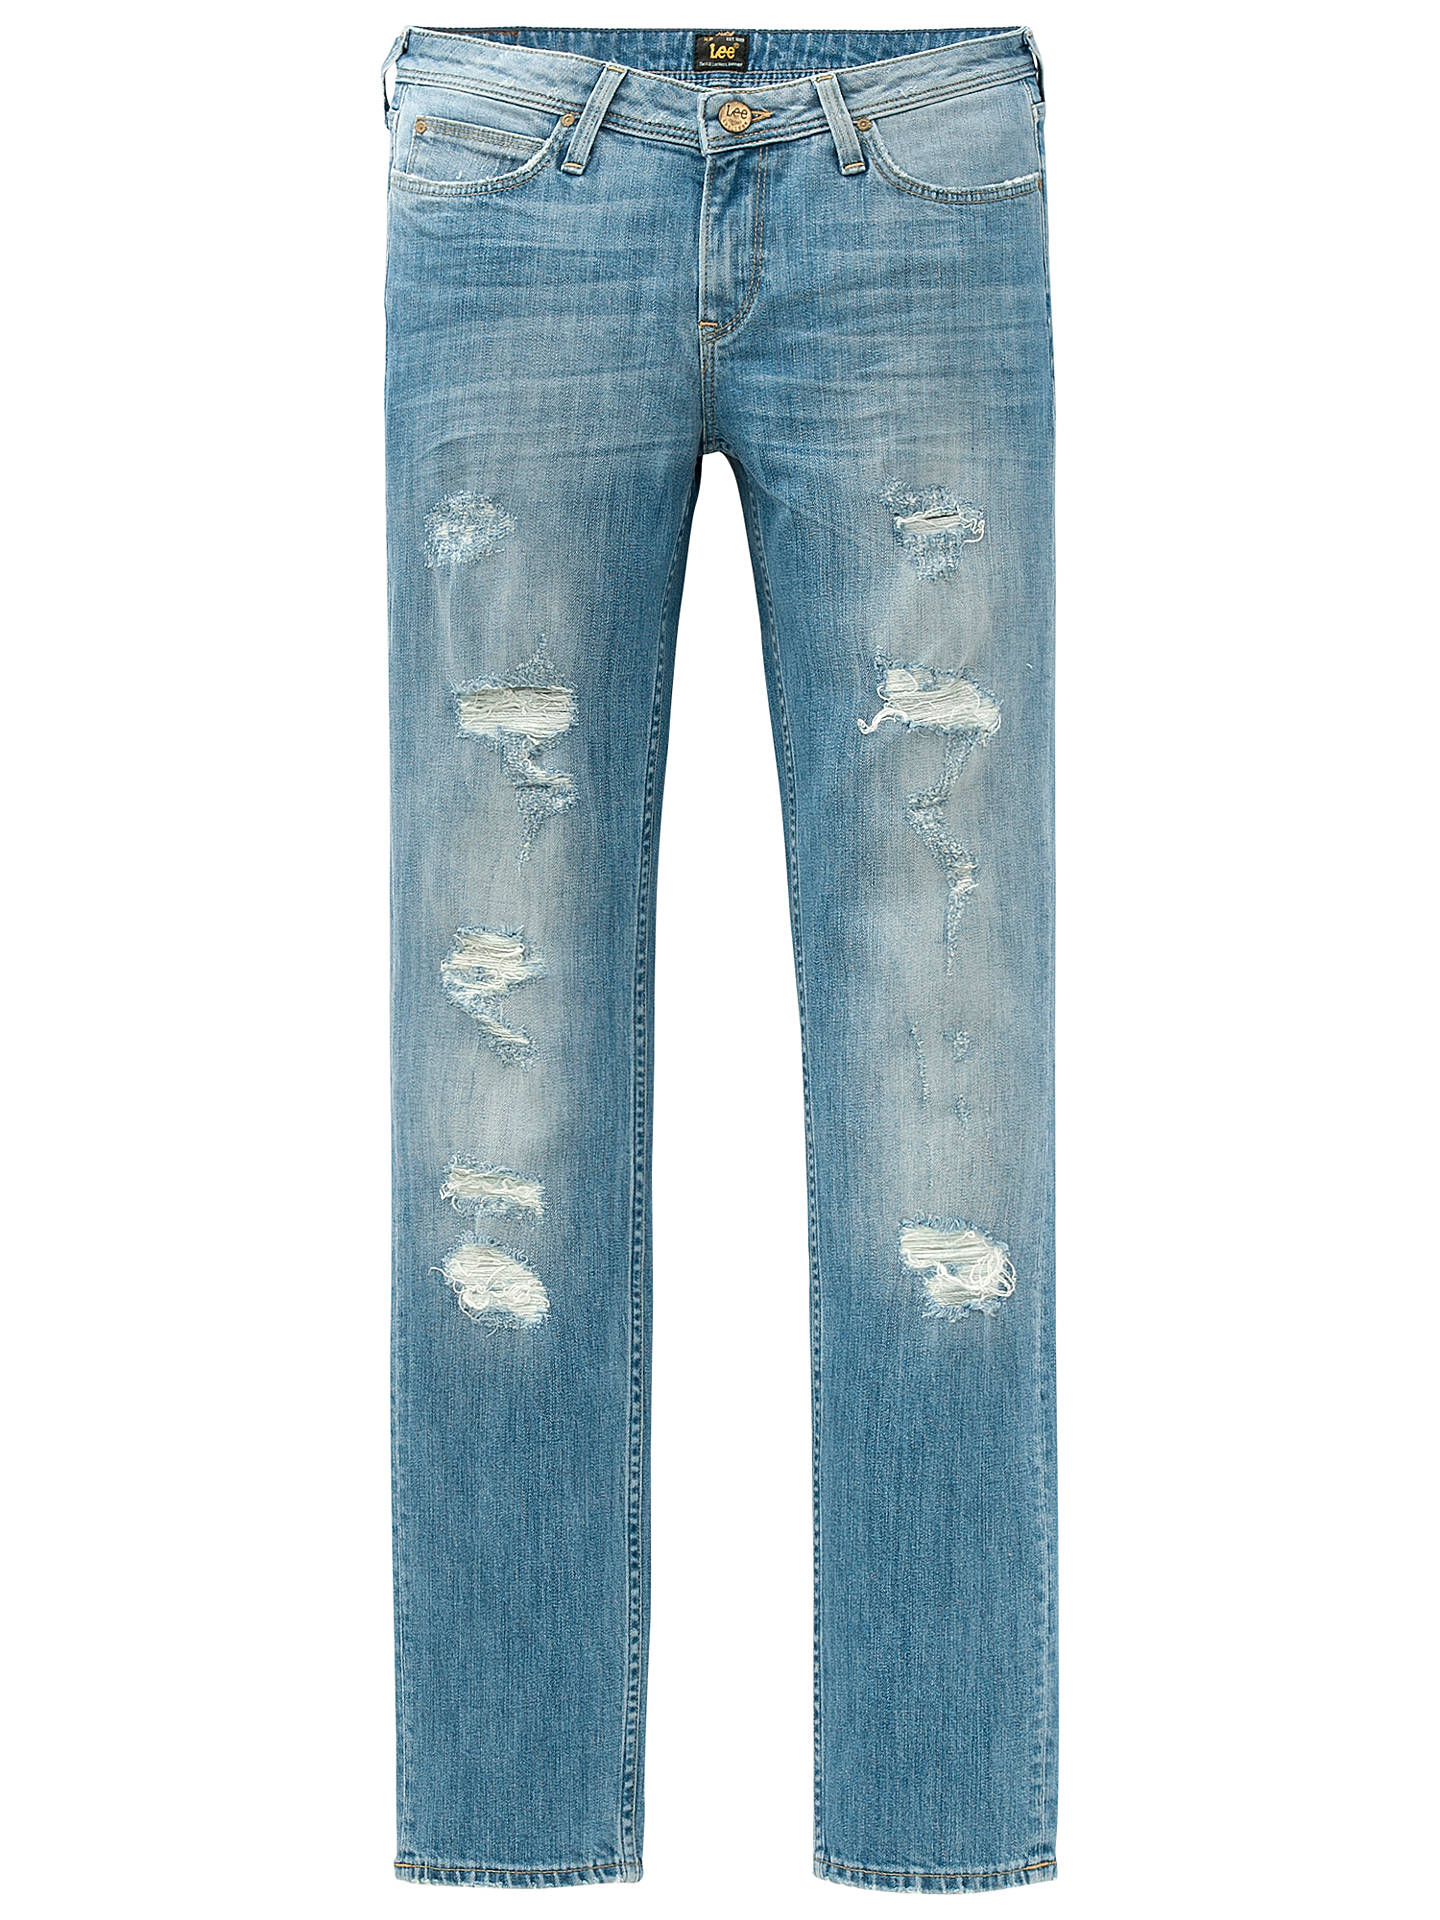 2aa9fc2a ... Buy Lee Emlyn Regular Waist Straight Leg Jeans, Blue Trash, W27/L31  Online